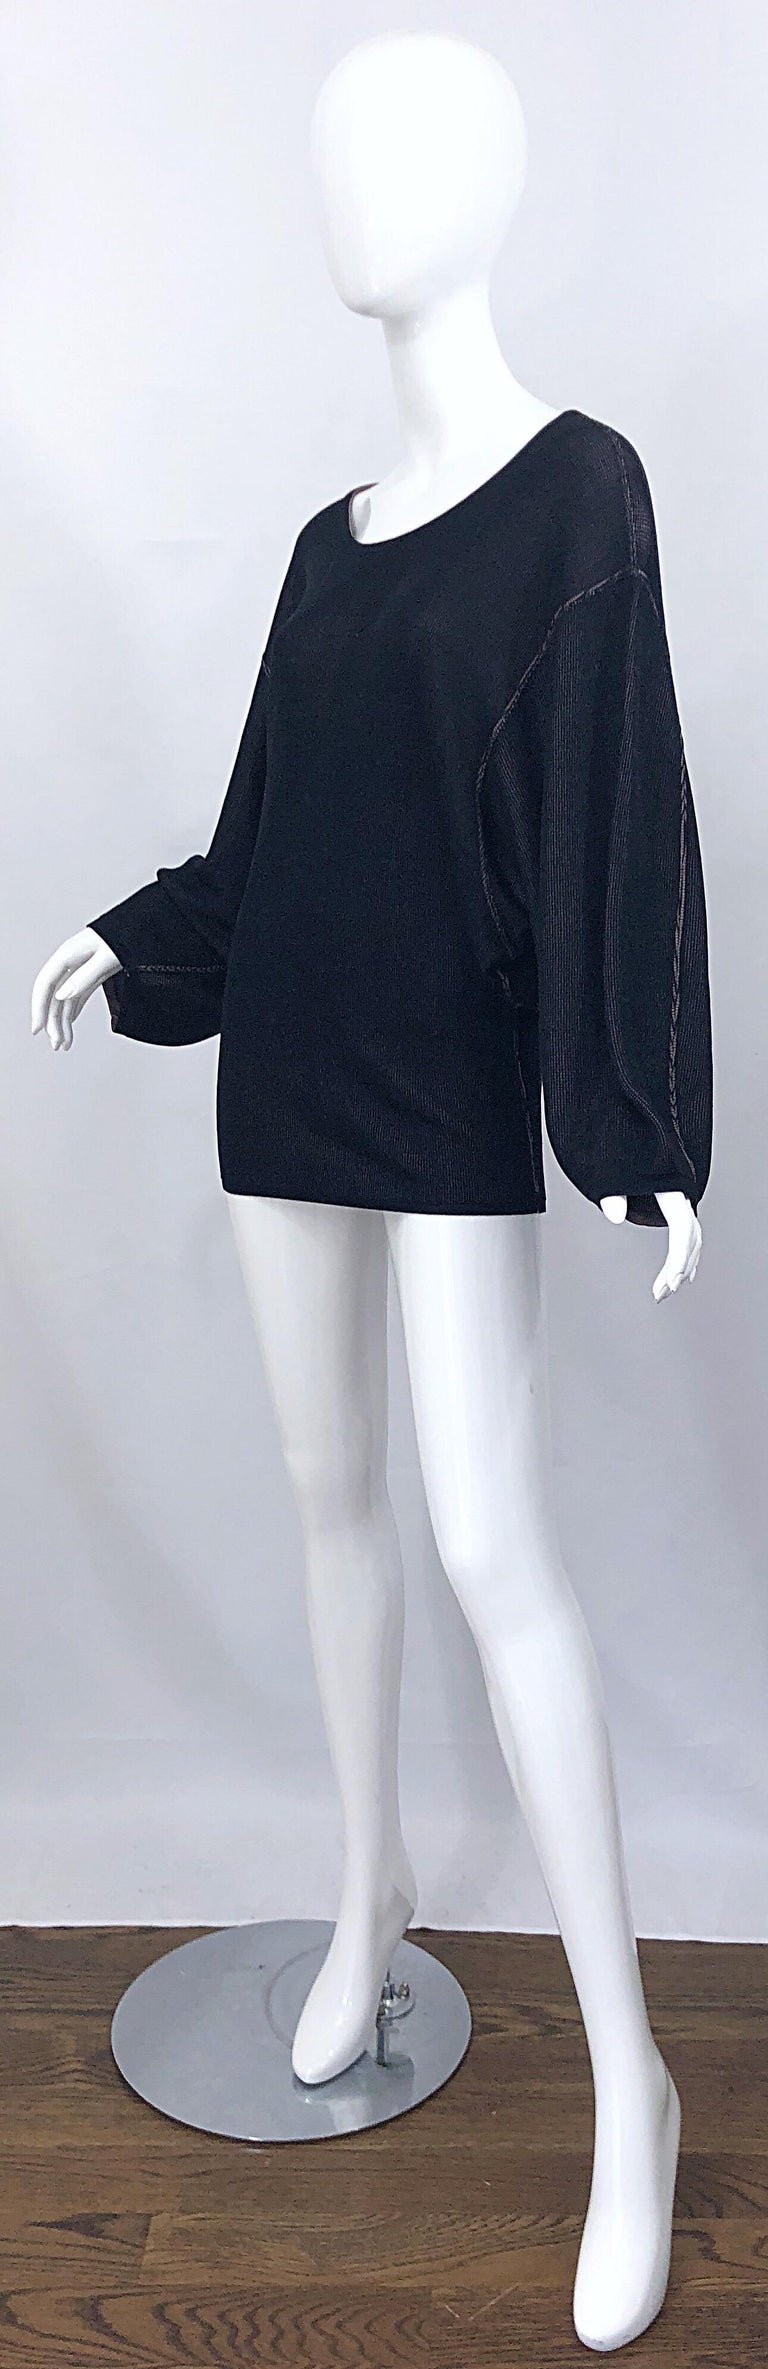 Vintage Azzedine Alaia 1980s  Black + Nude Viscose 80s Mini Sweater Dress Tunic In Excellent Condition For Sale In Chicago, IL